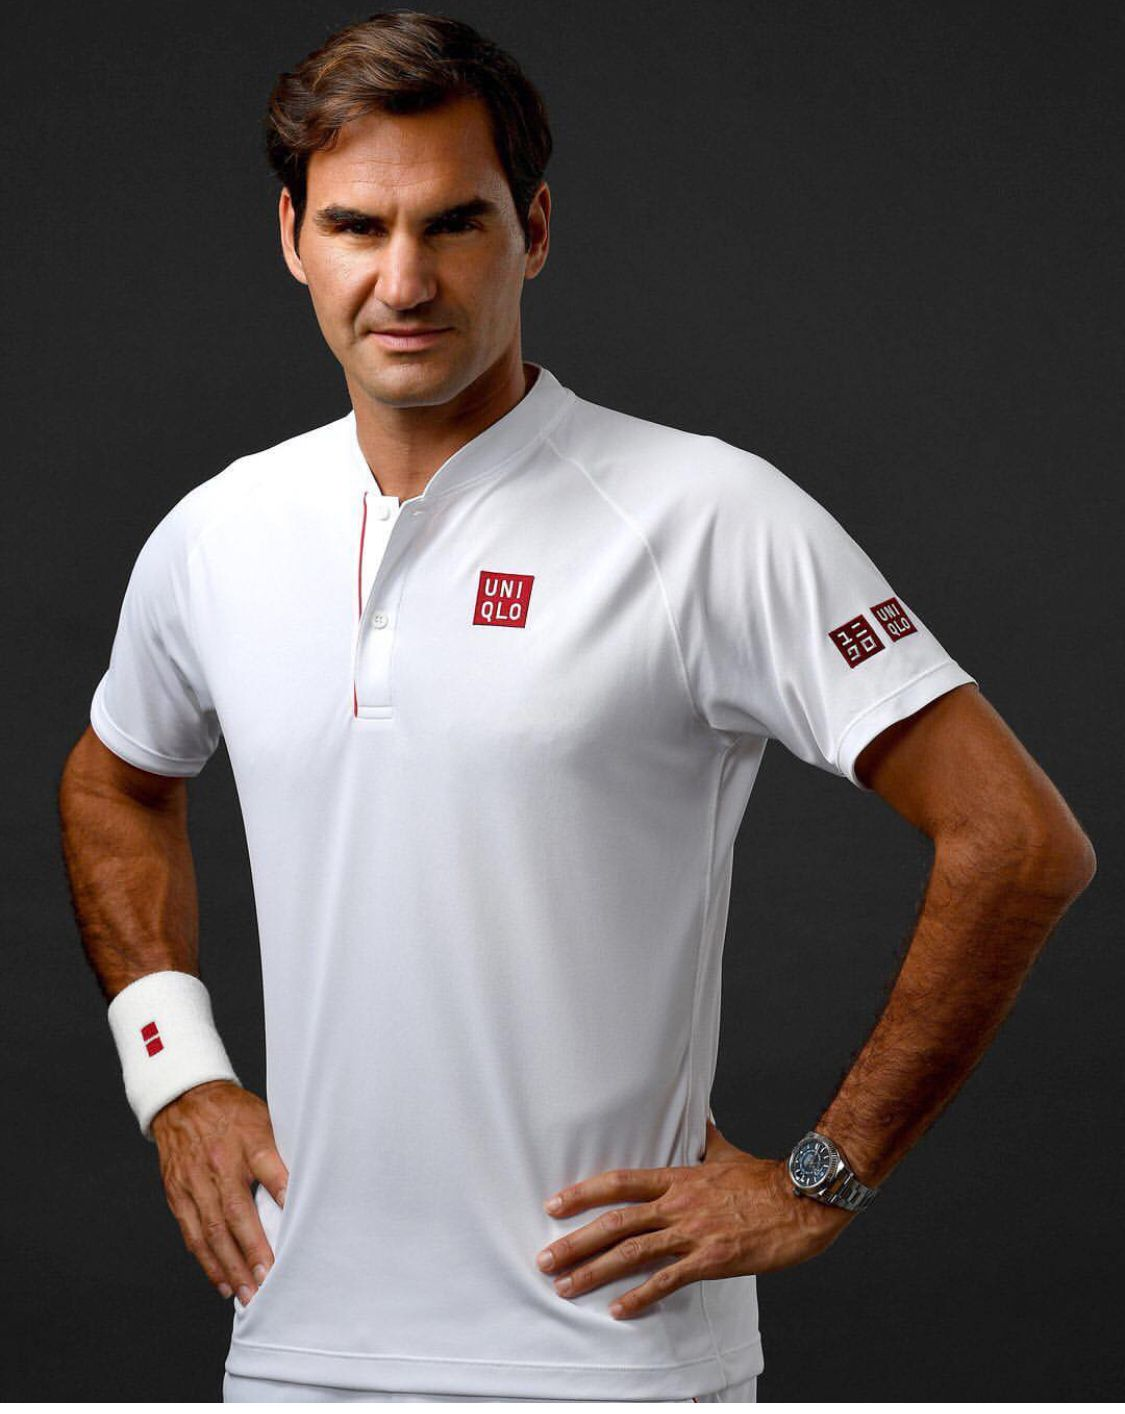 74d72926 Activewear UNIQLO × Roger Federer Tennis Polo Shirt 2018 Wimbledon model  NEW!